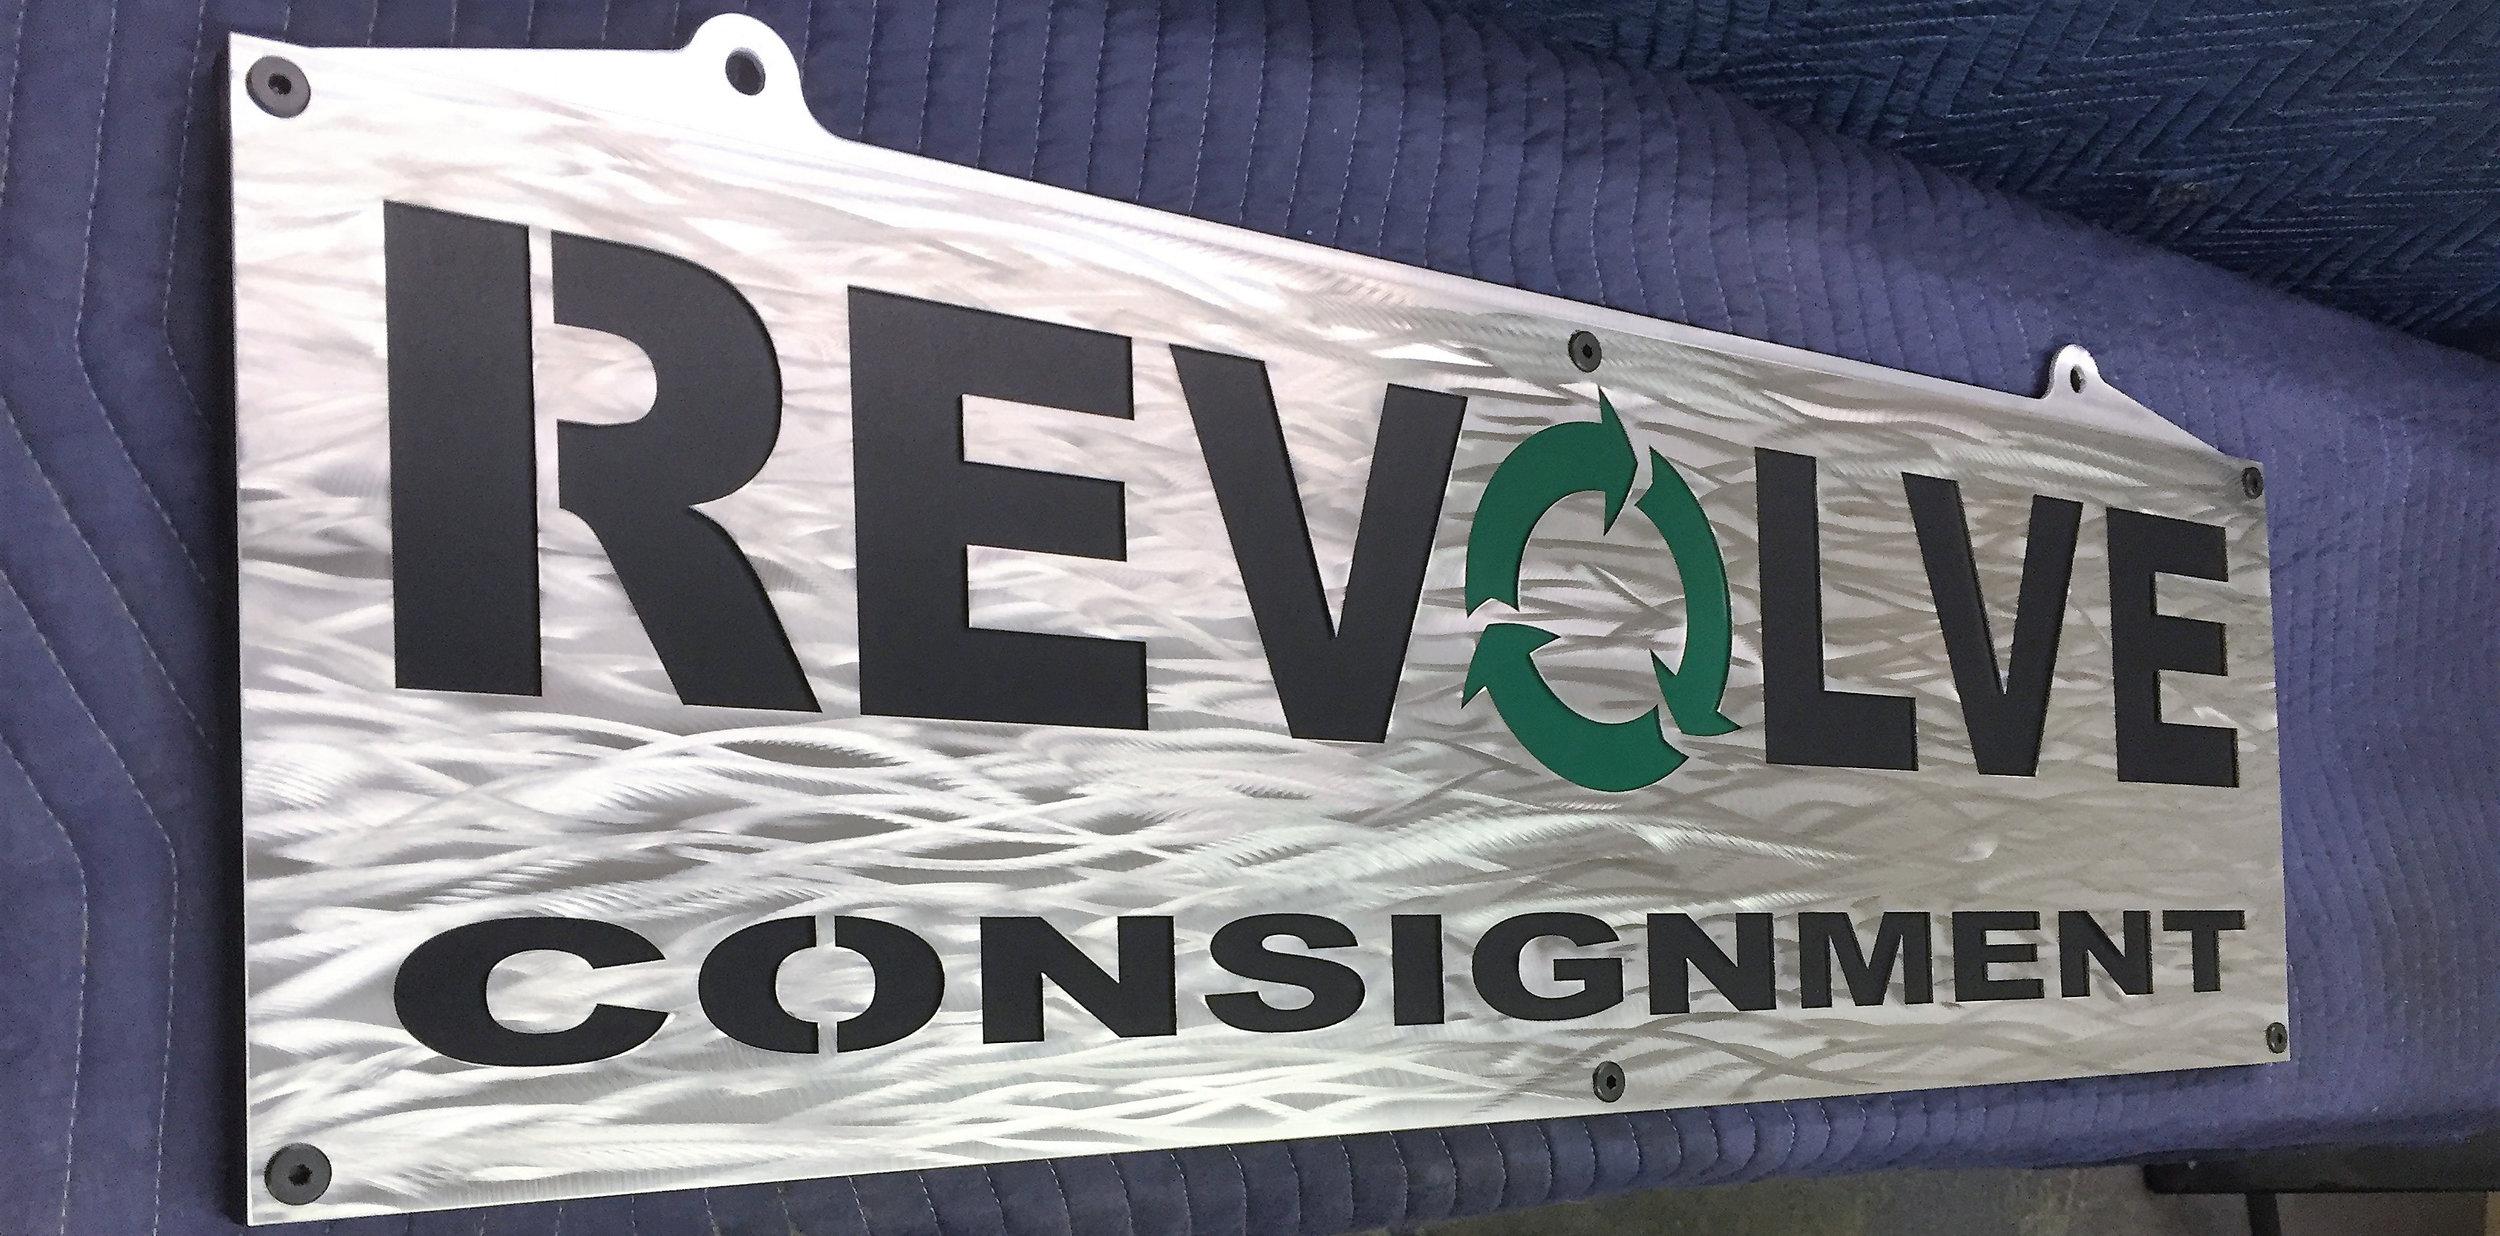 Revolve Consignment Signage.jpg